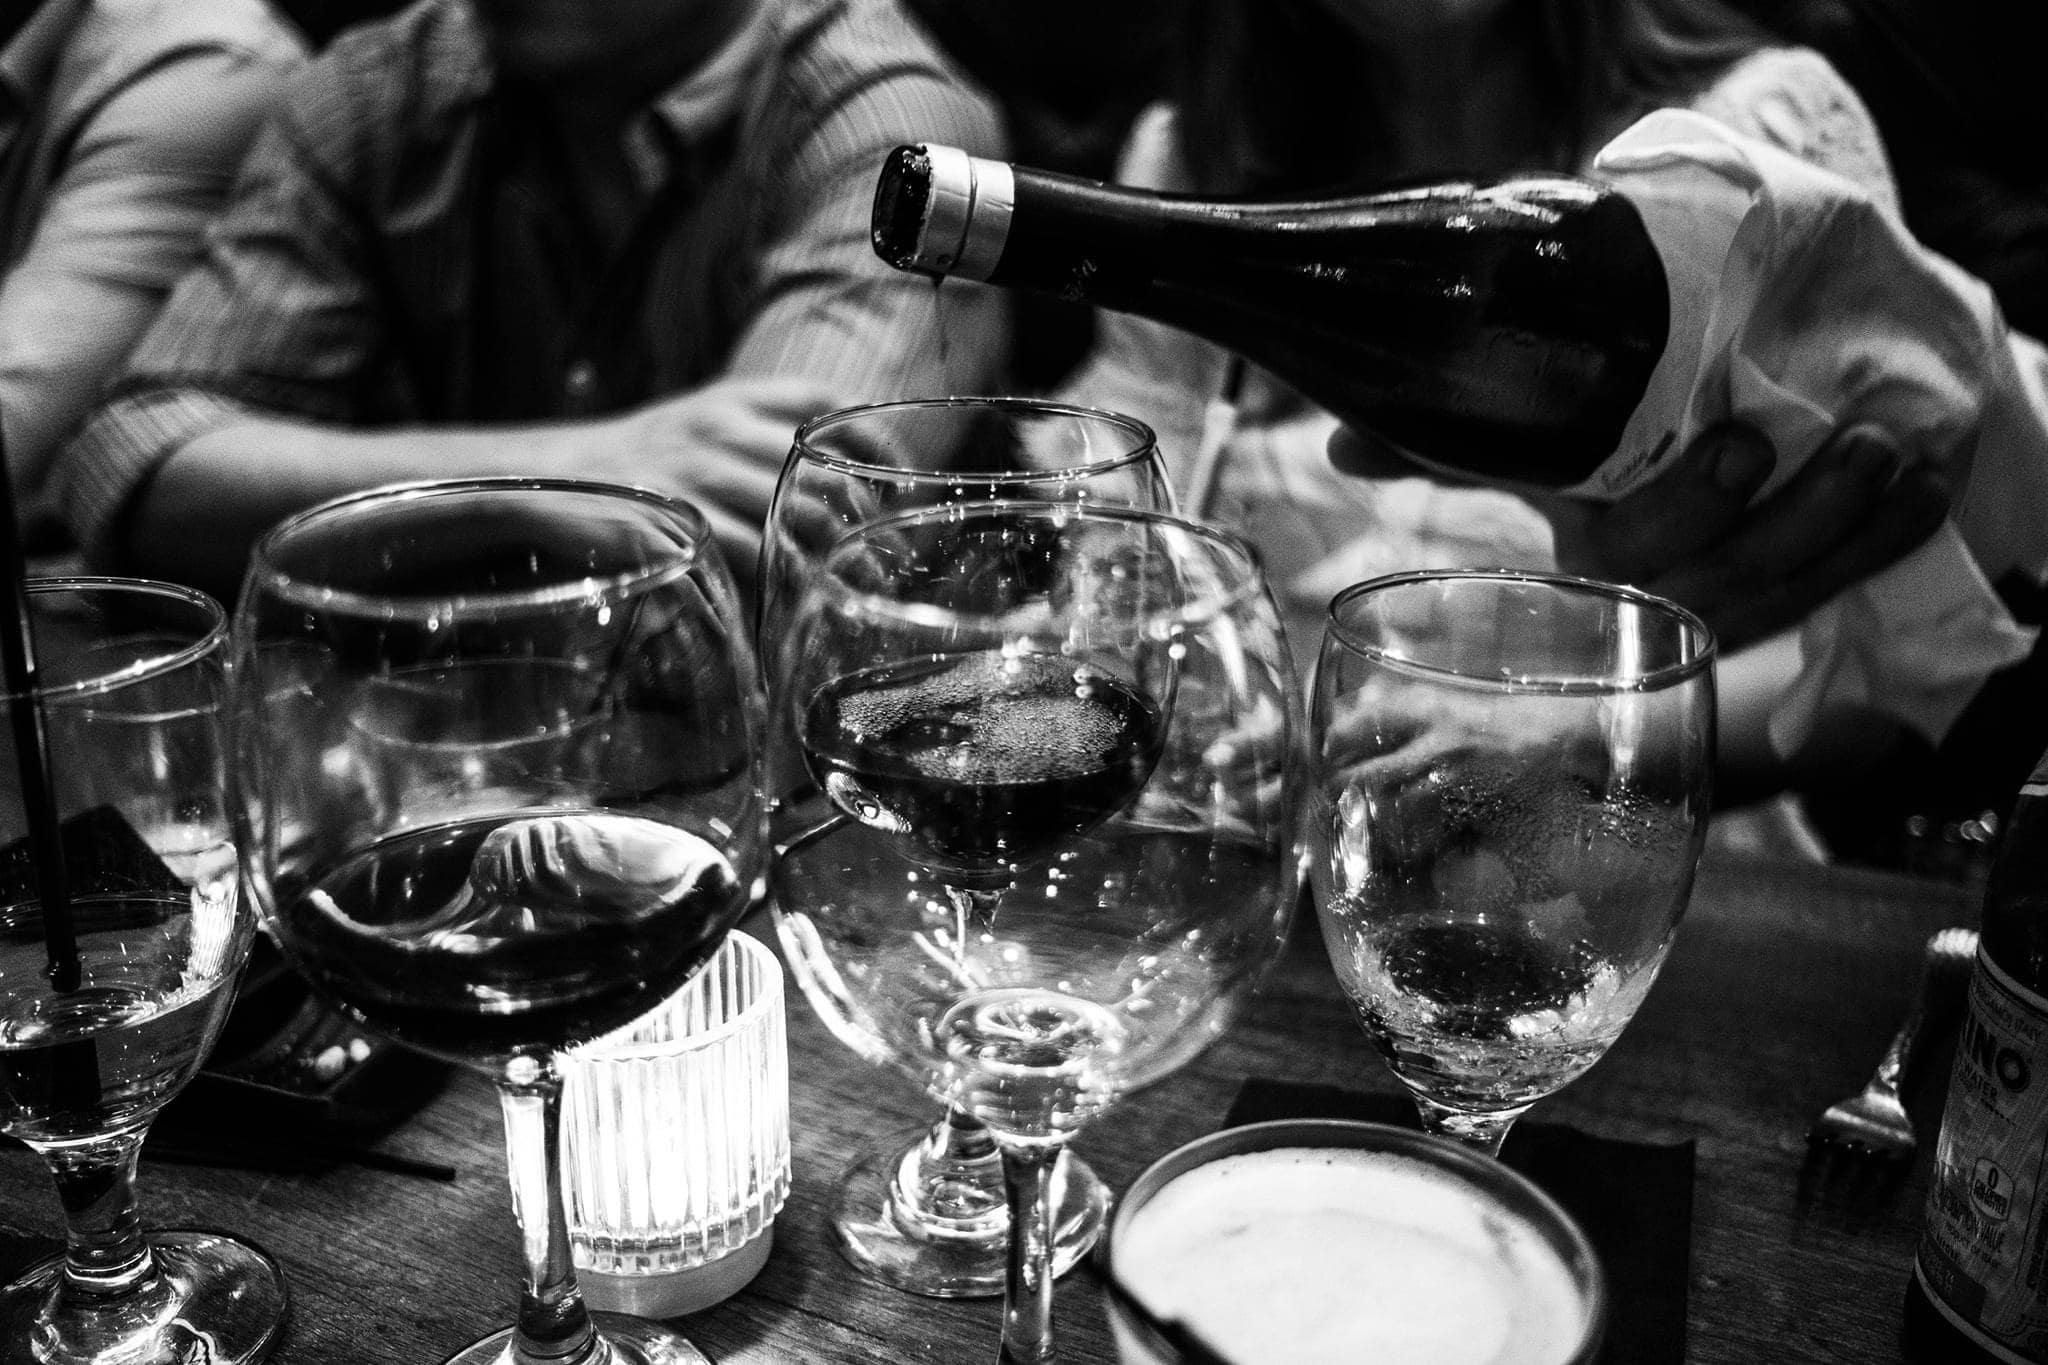 Florida Alcohol Licensing